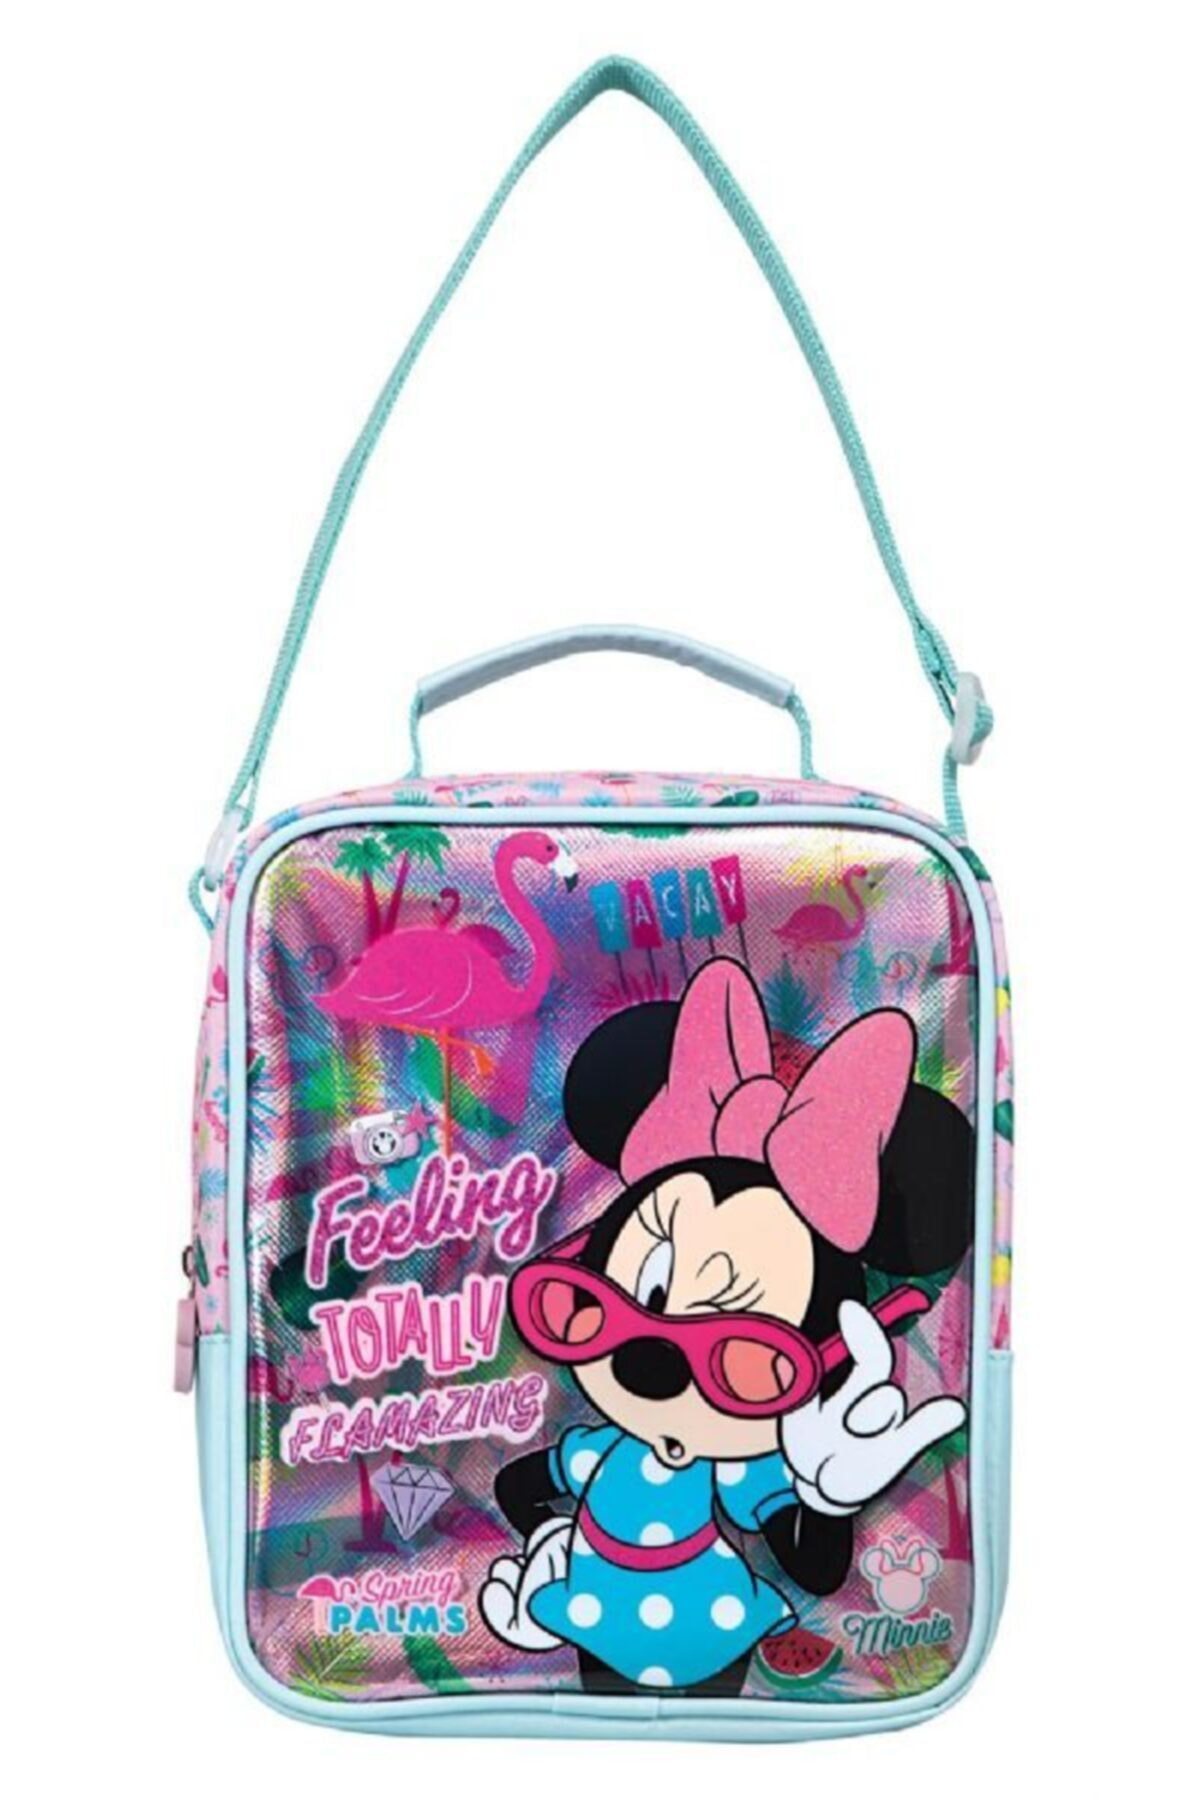 Frocx Minnie Mouse Pembe Lüks Ilkokul Beslenme Çantası - Kız Çocuk 1